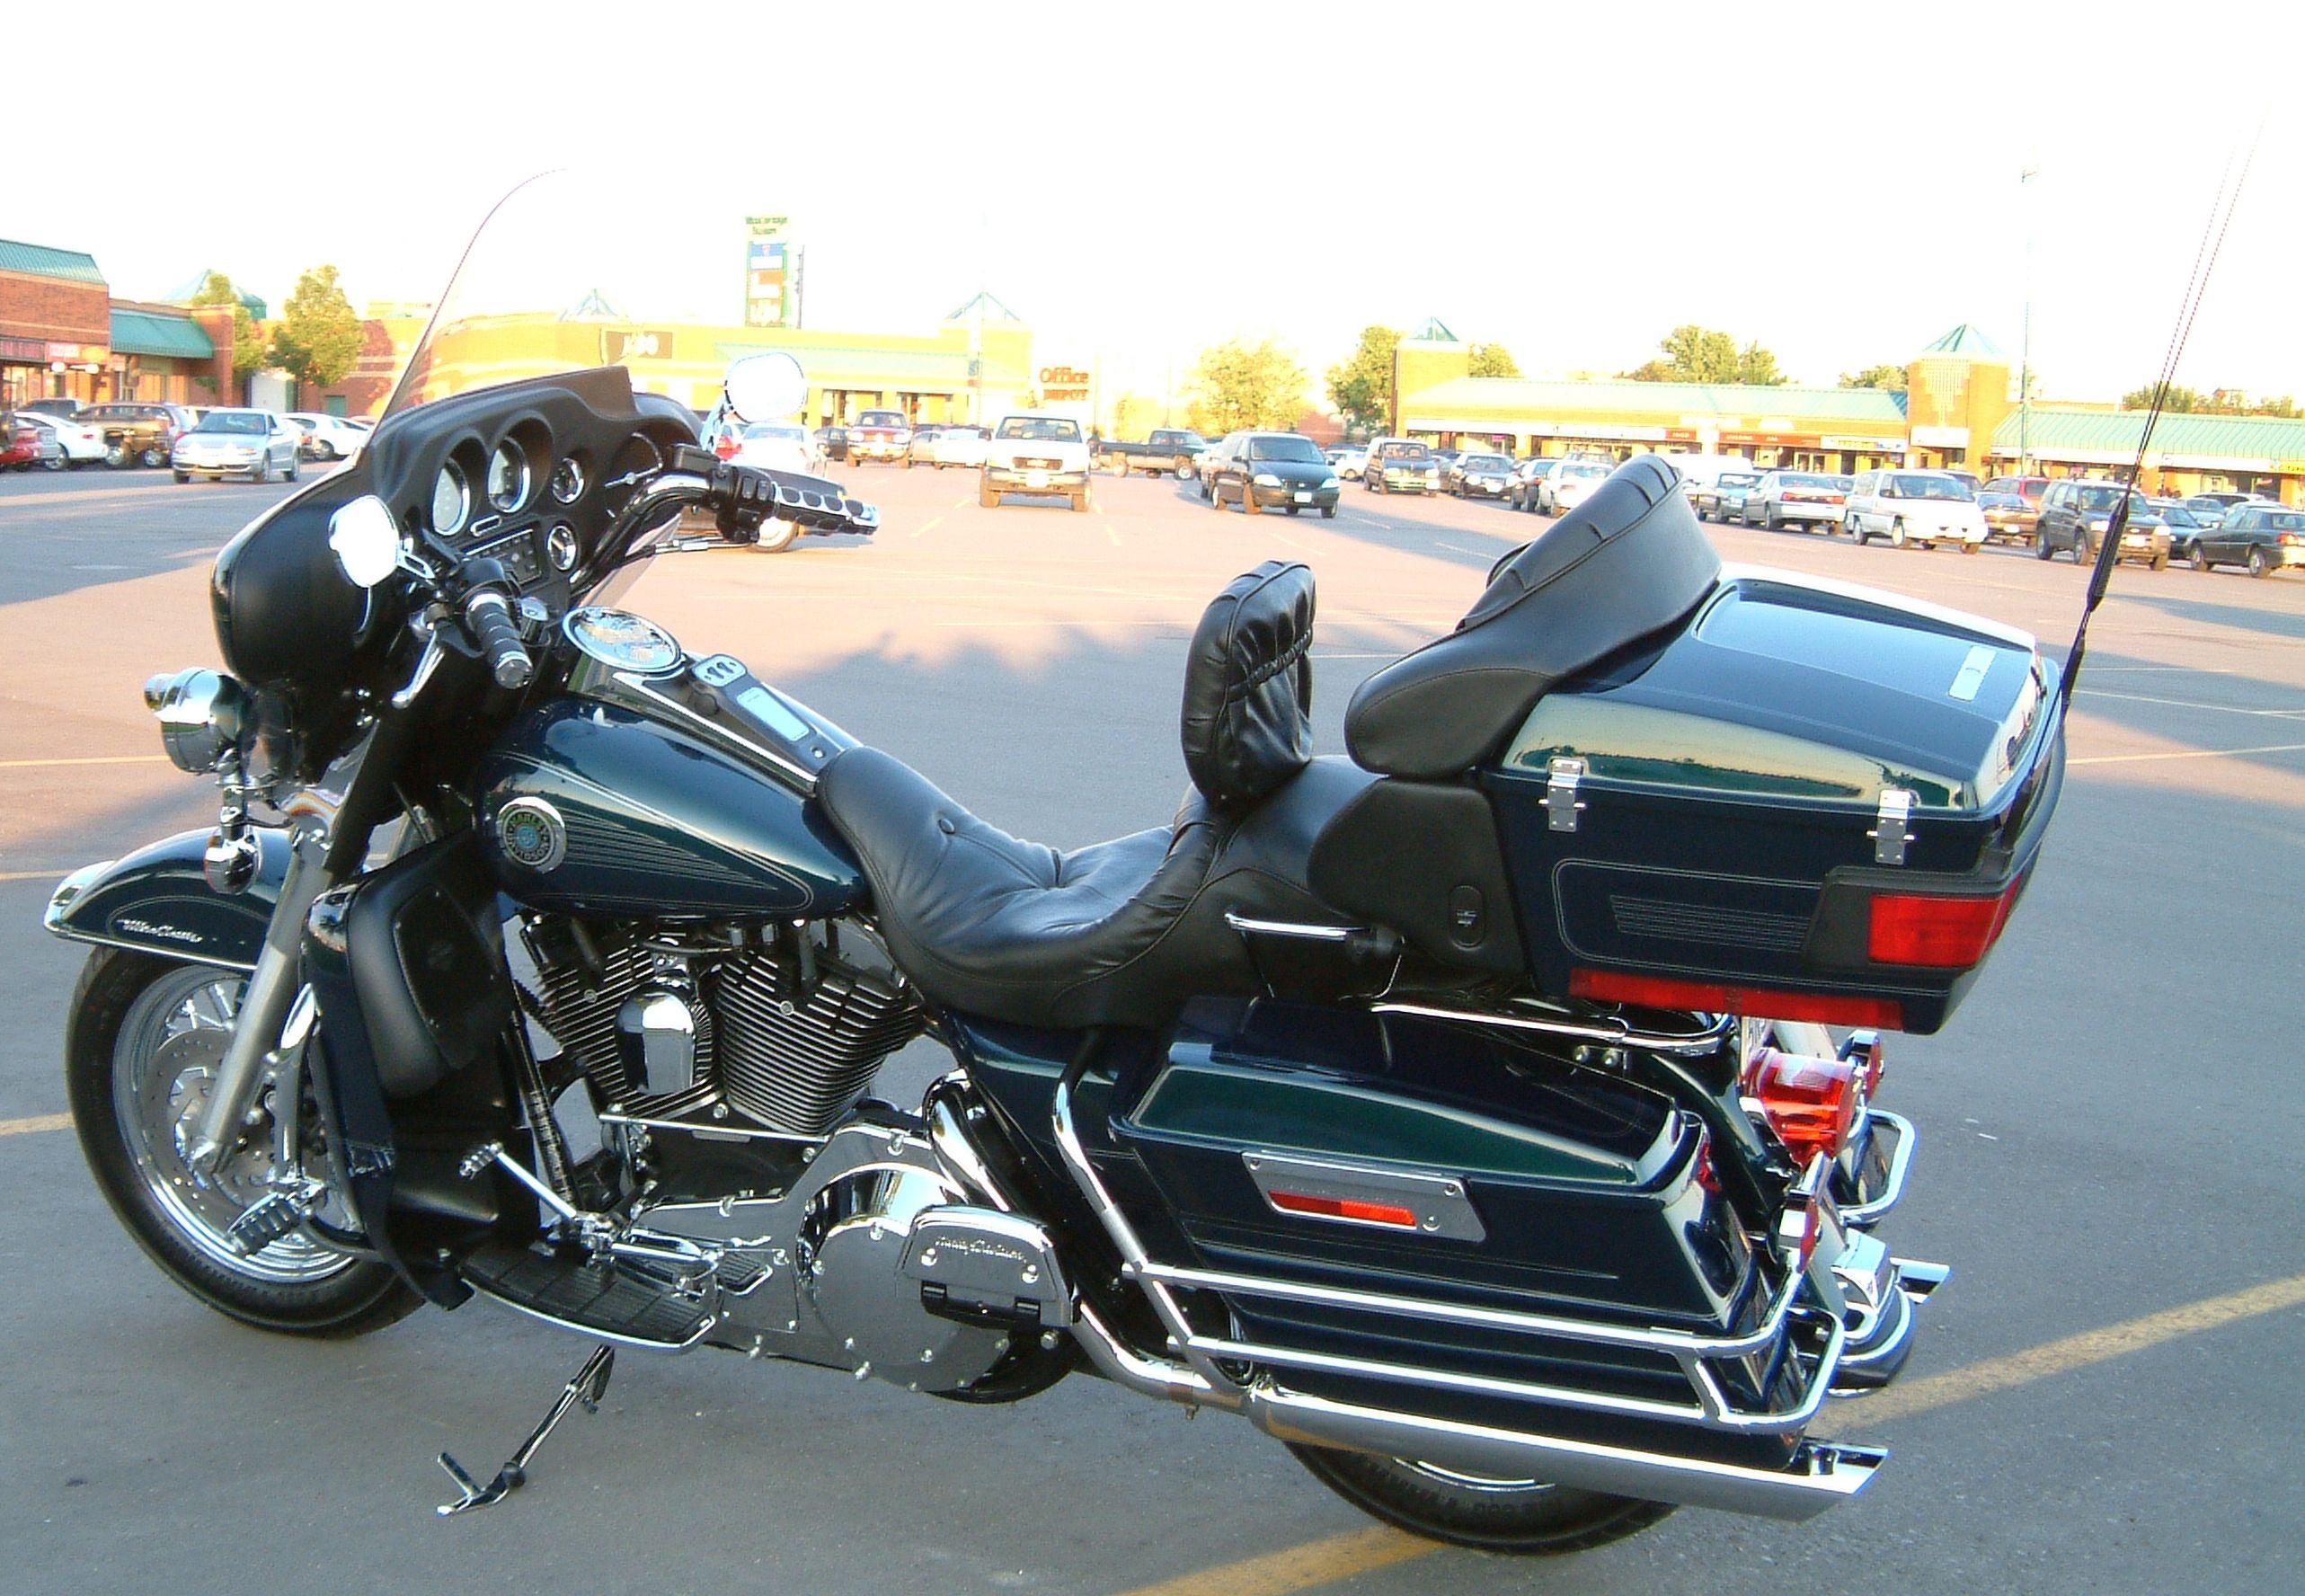 2001 Harley Davidson FLHTCUI Electra Glide Ultra Classic ...